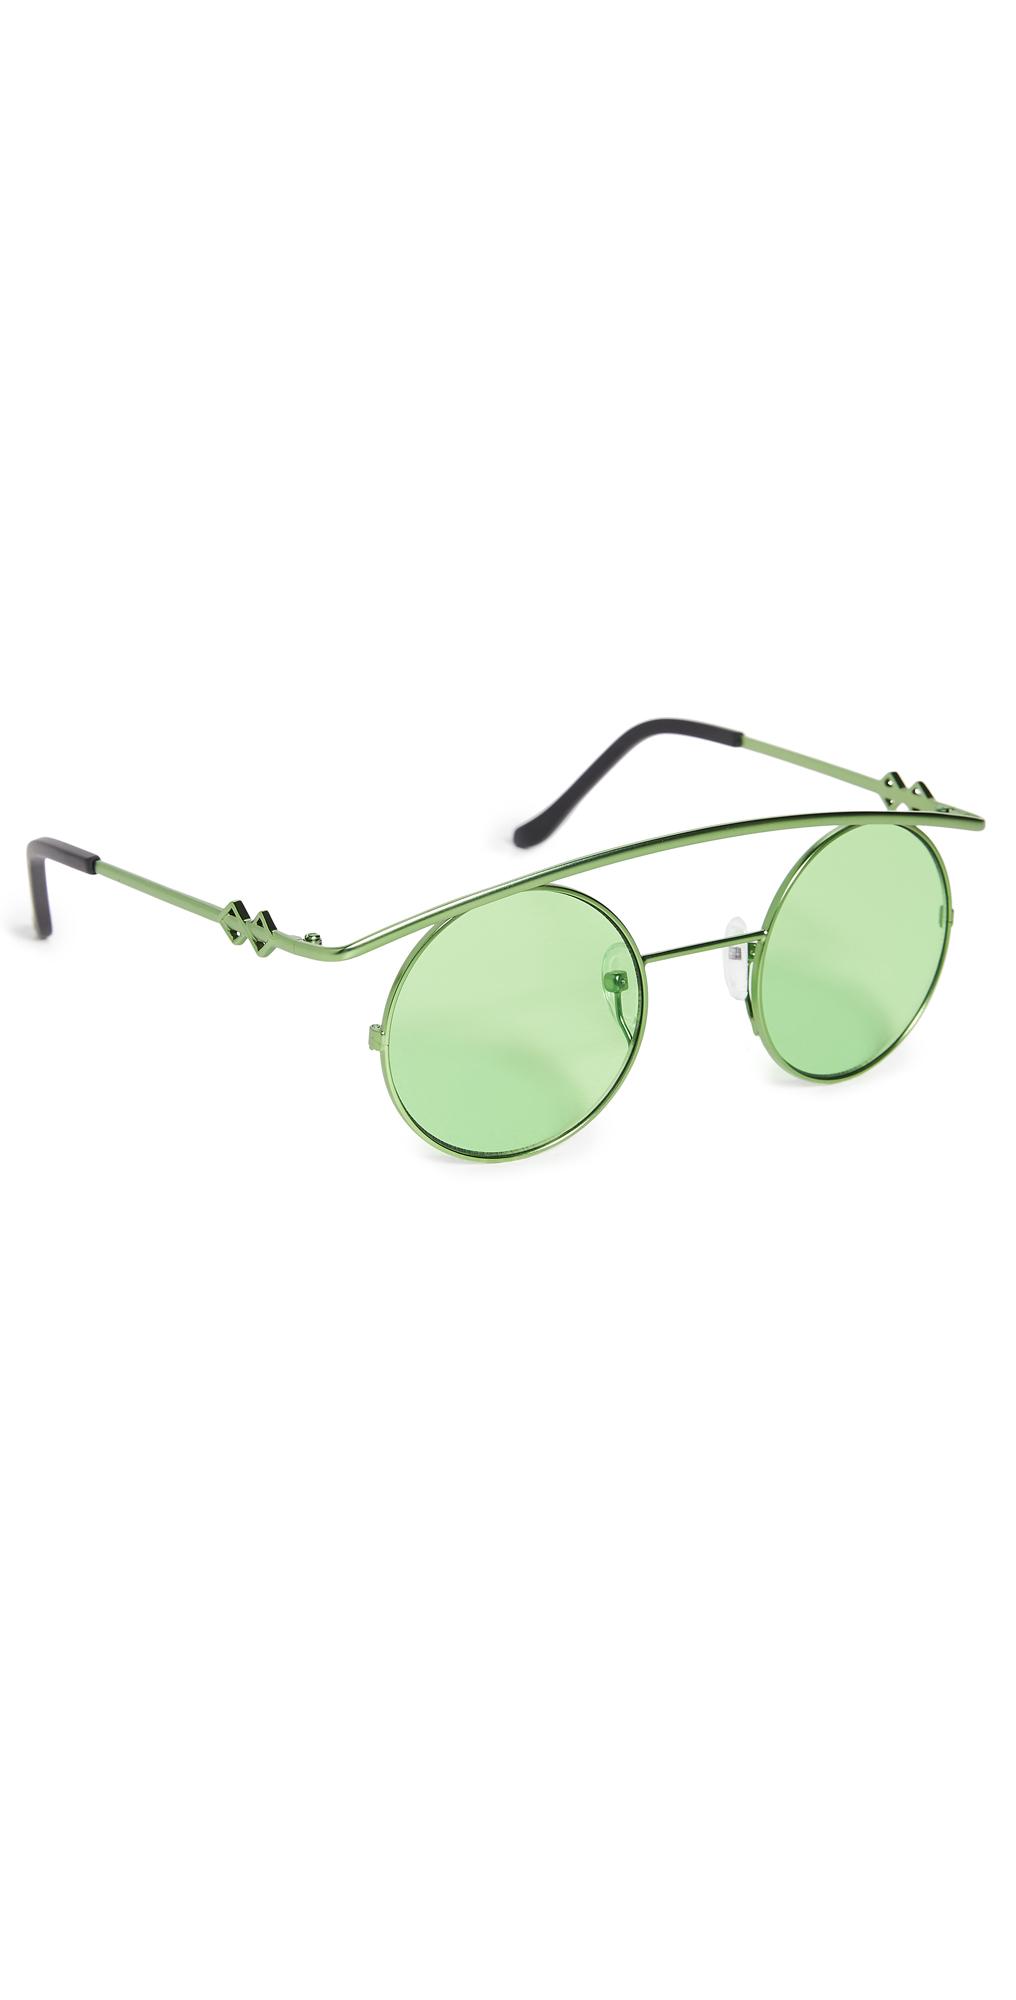 Retro's Sunglasses